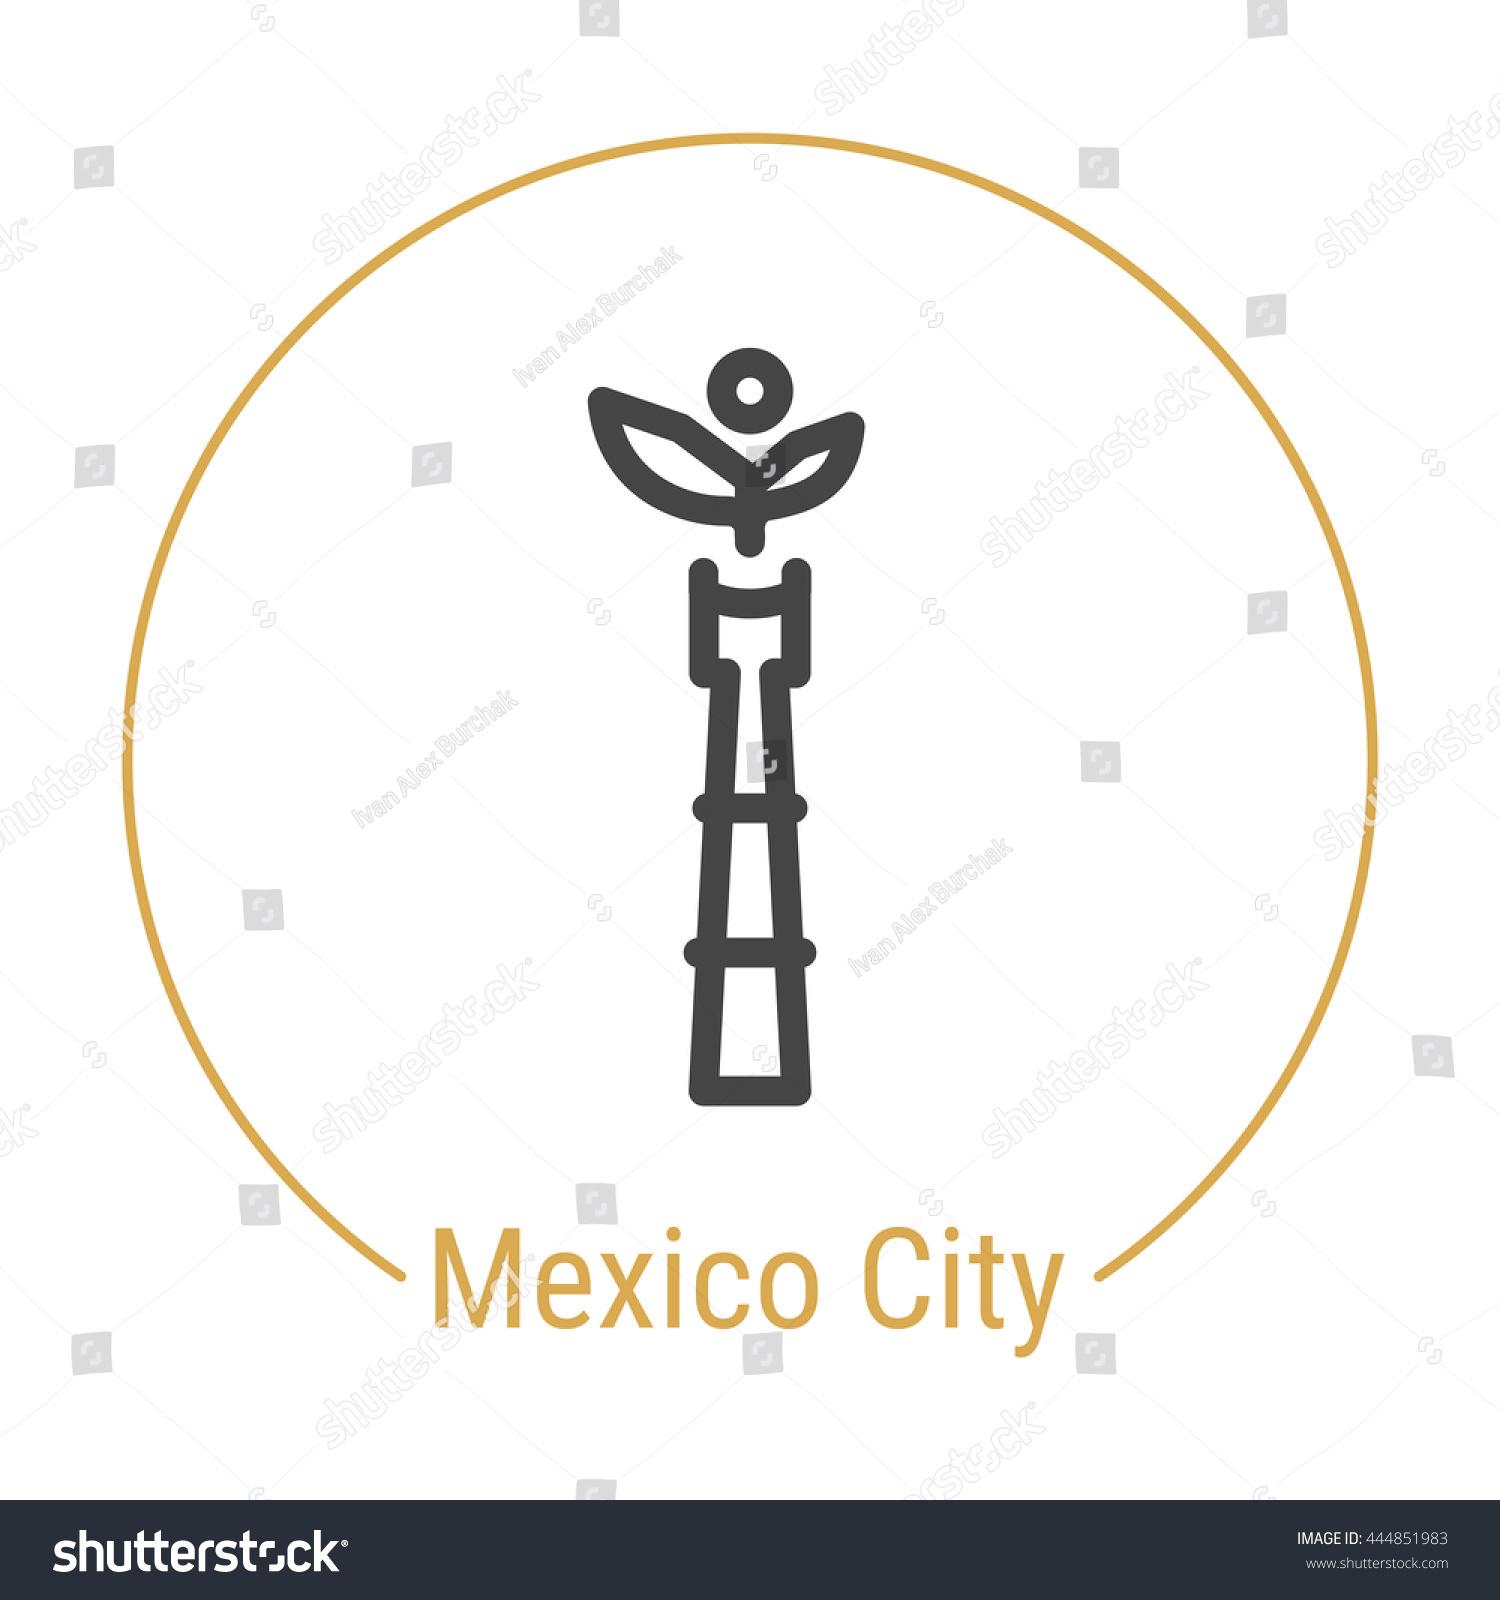 Mexico City Mexico Outline Icon Caption Stock Vector Royalty Free